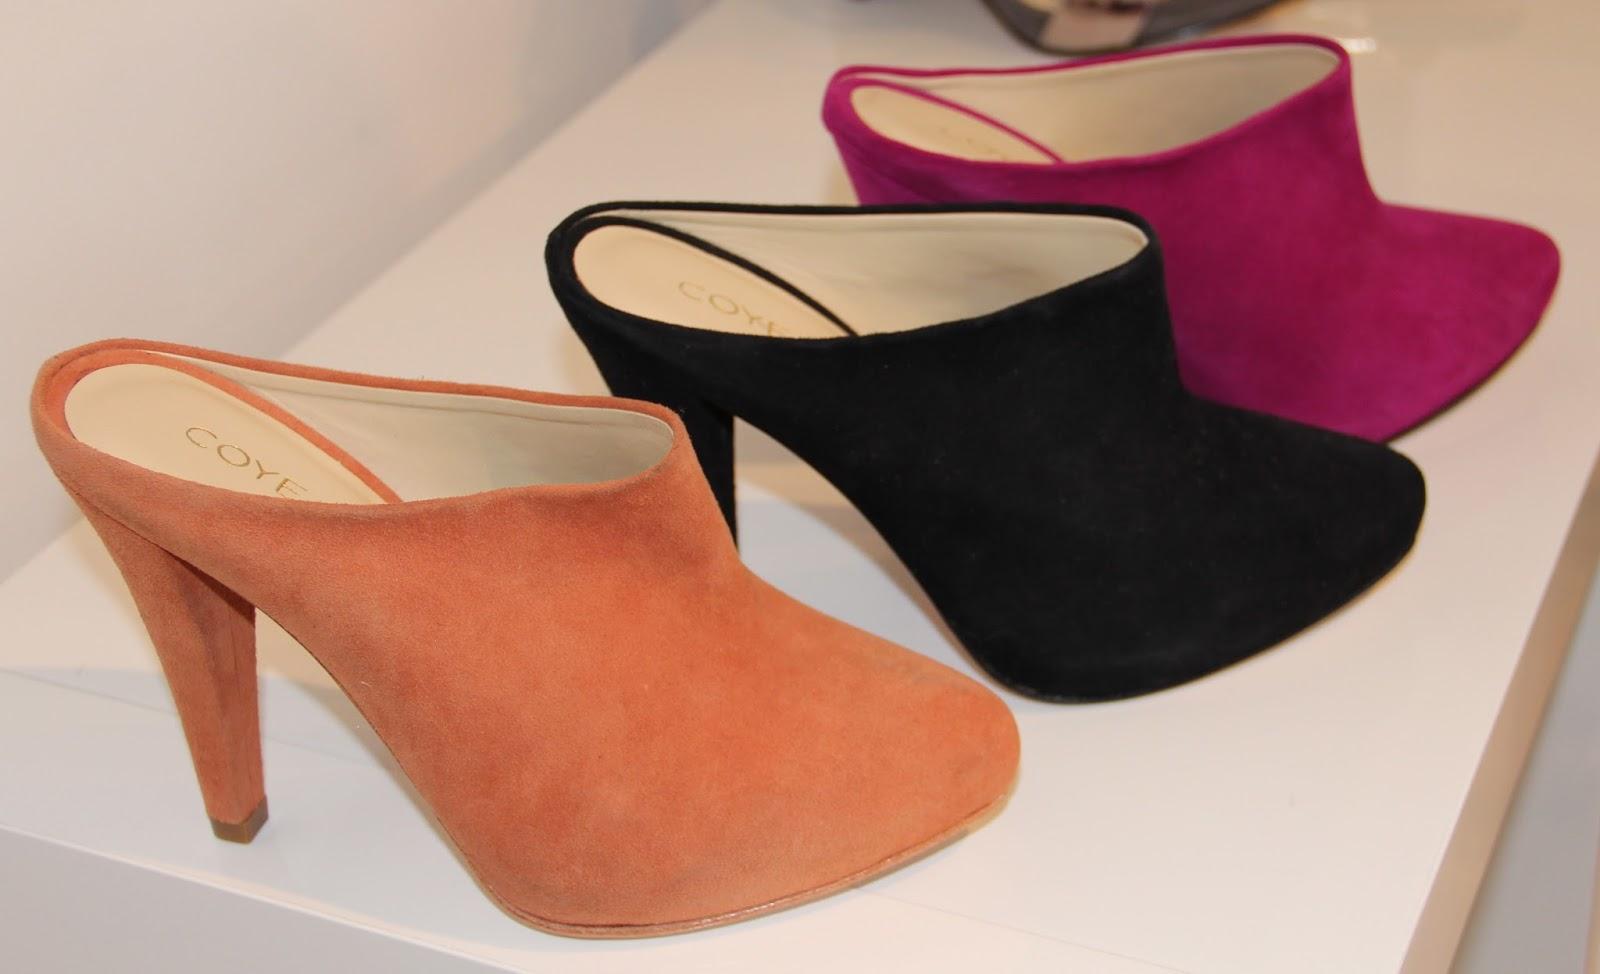 e50adfe3 COYE NOKES Footwear Fall/Winter 2013 Pumps, Boots, Flats, Sandals